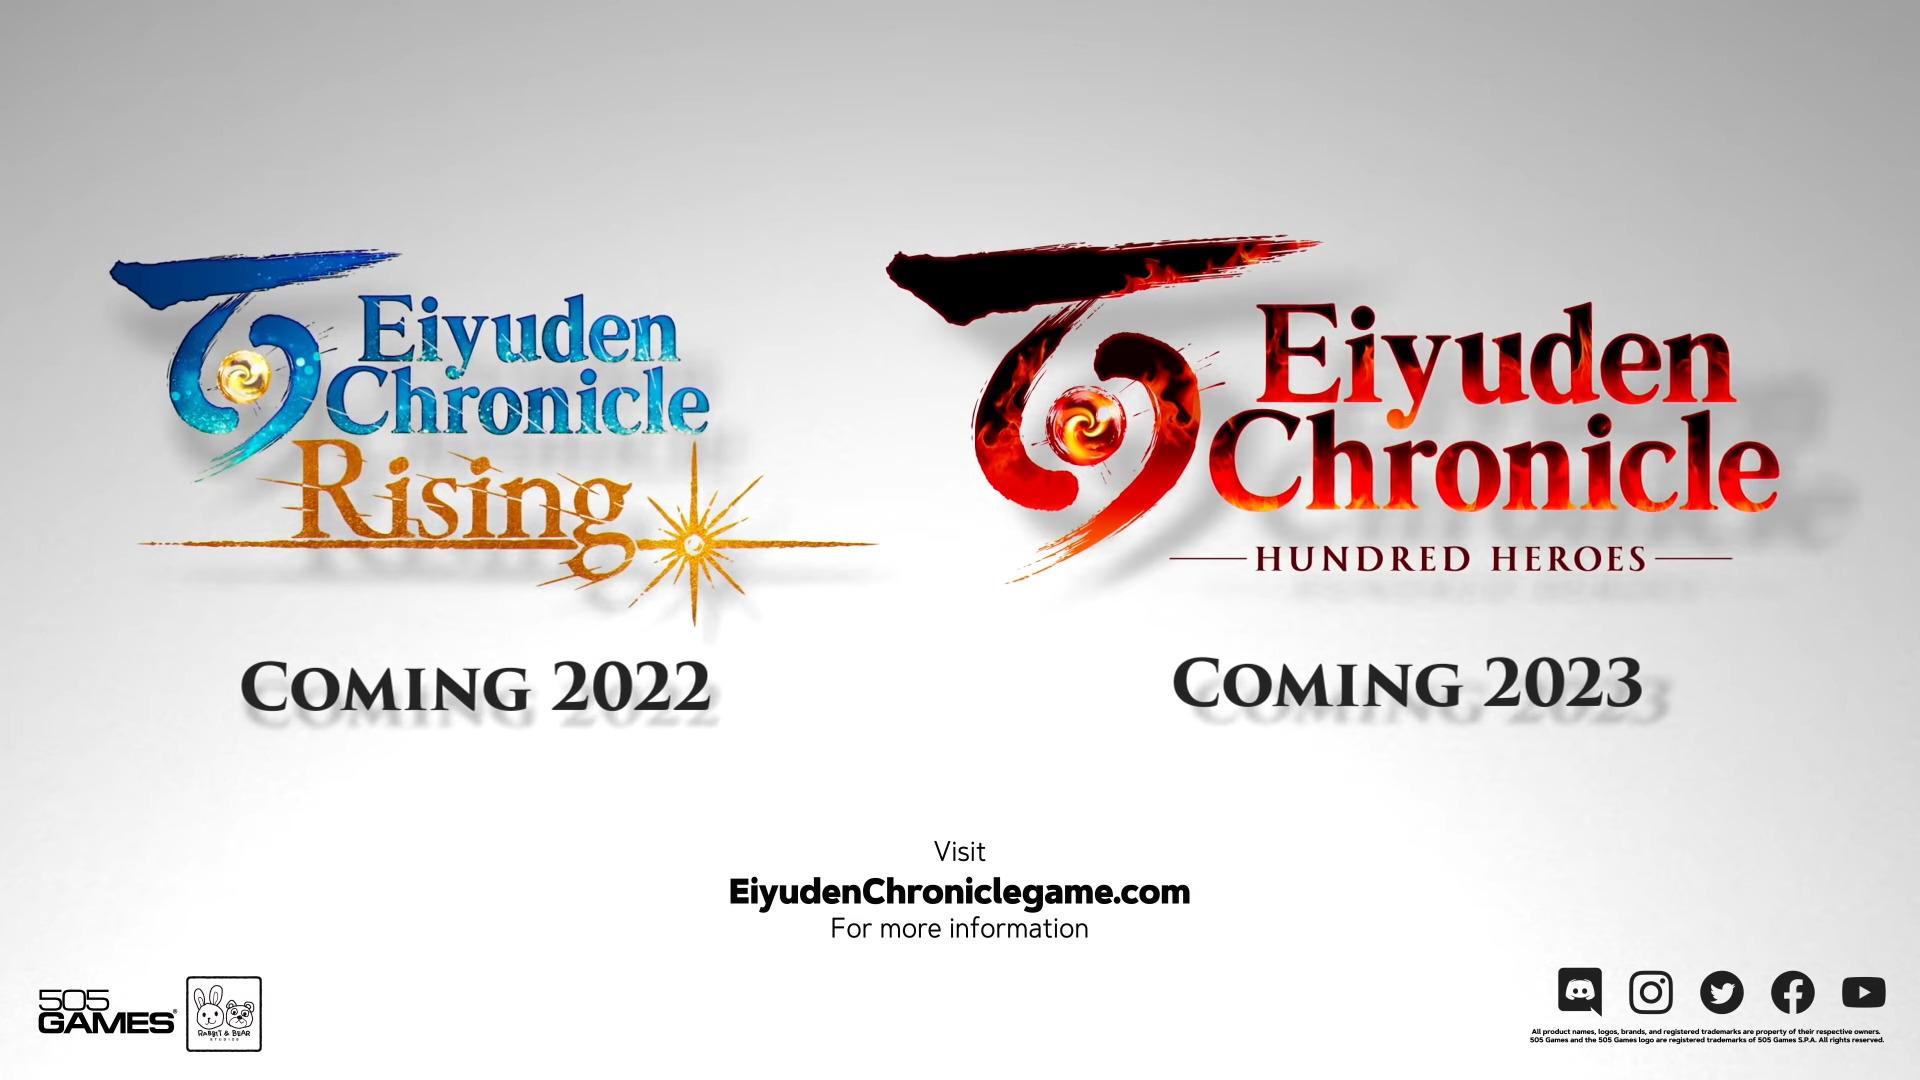 Eiyuden Chronicle Hundred Heroes Announcement Trailer